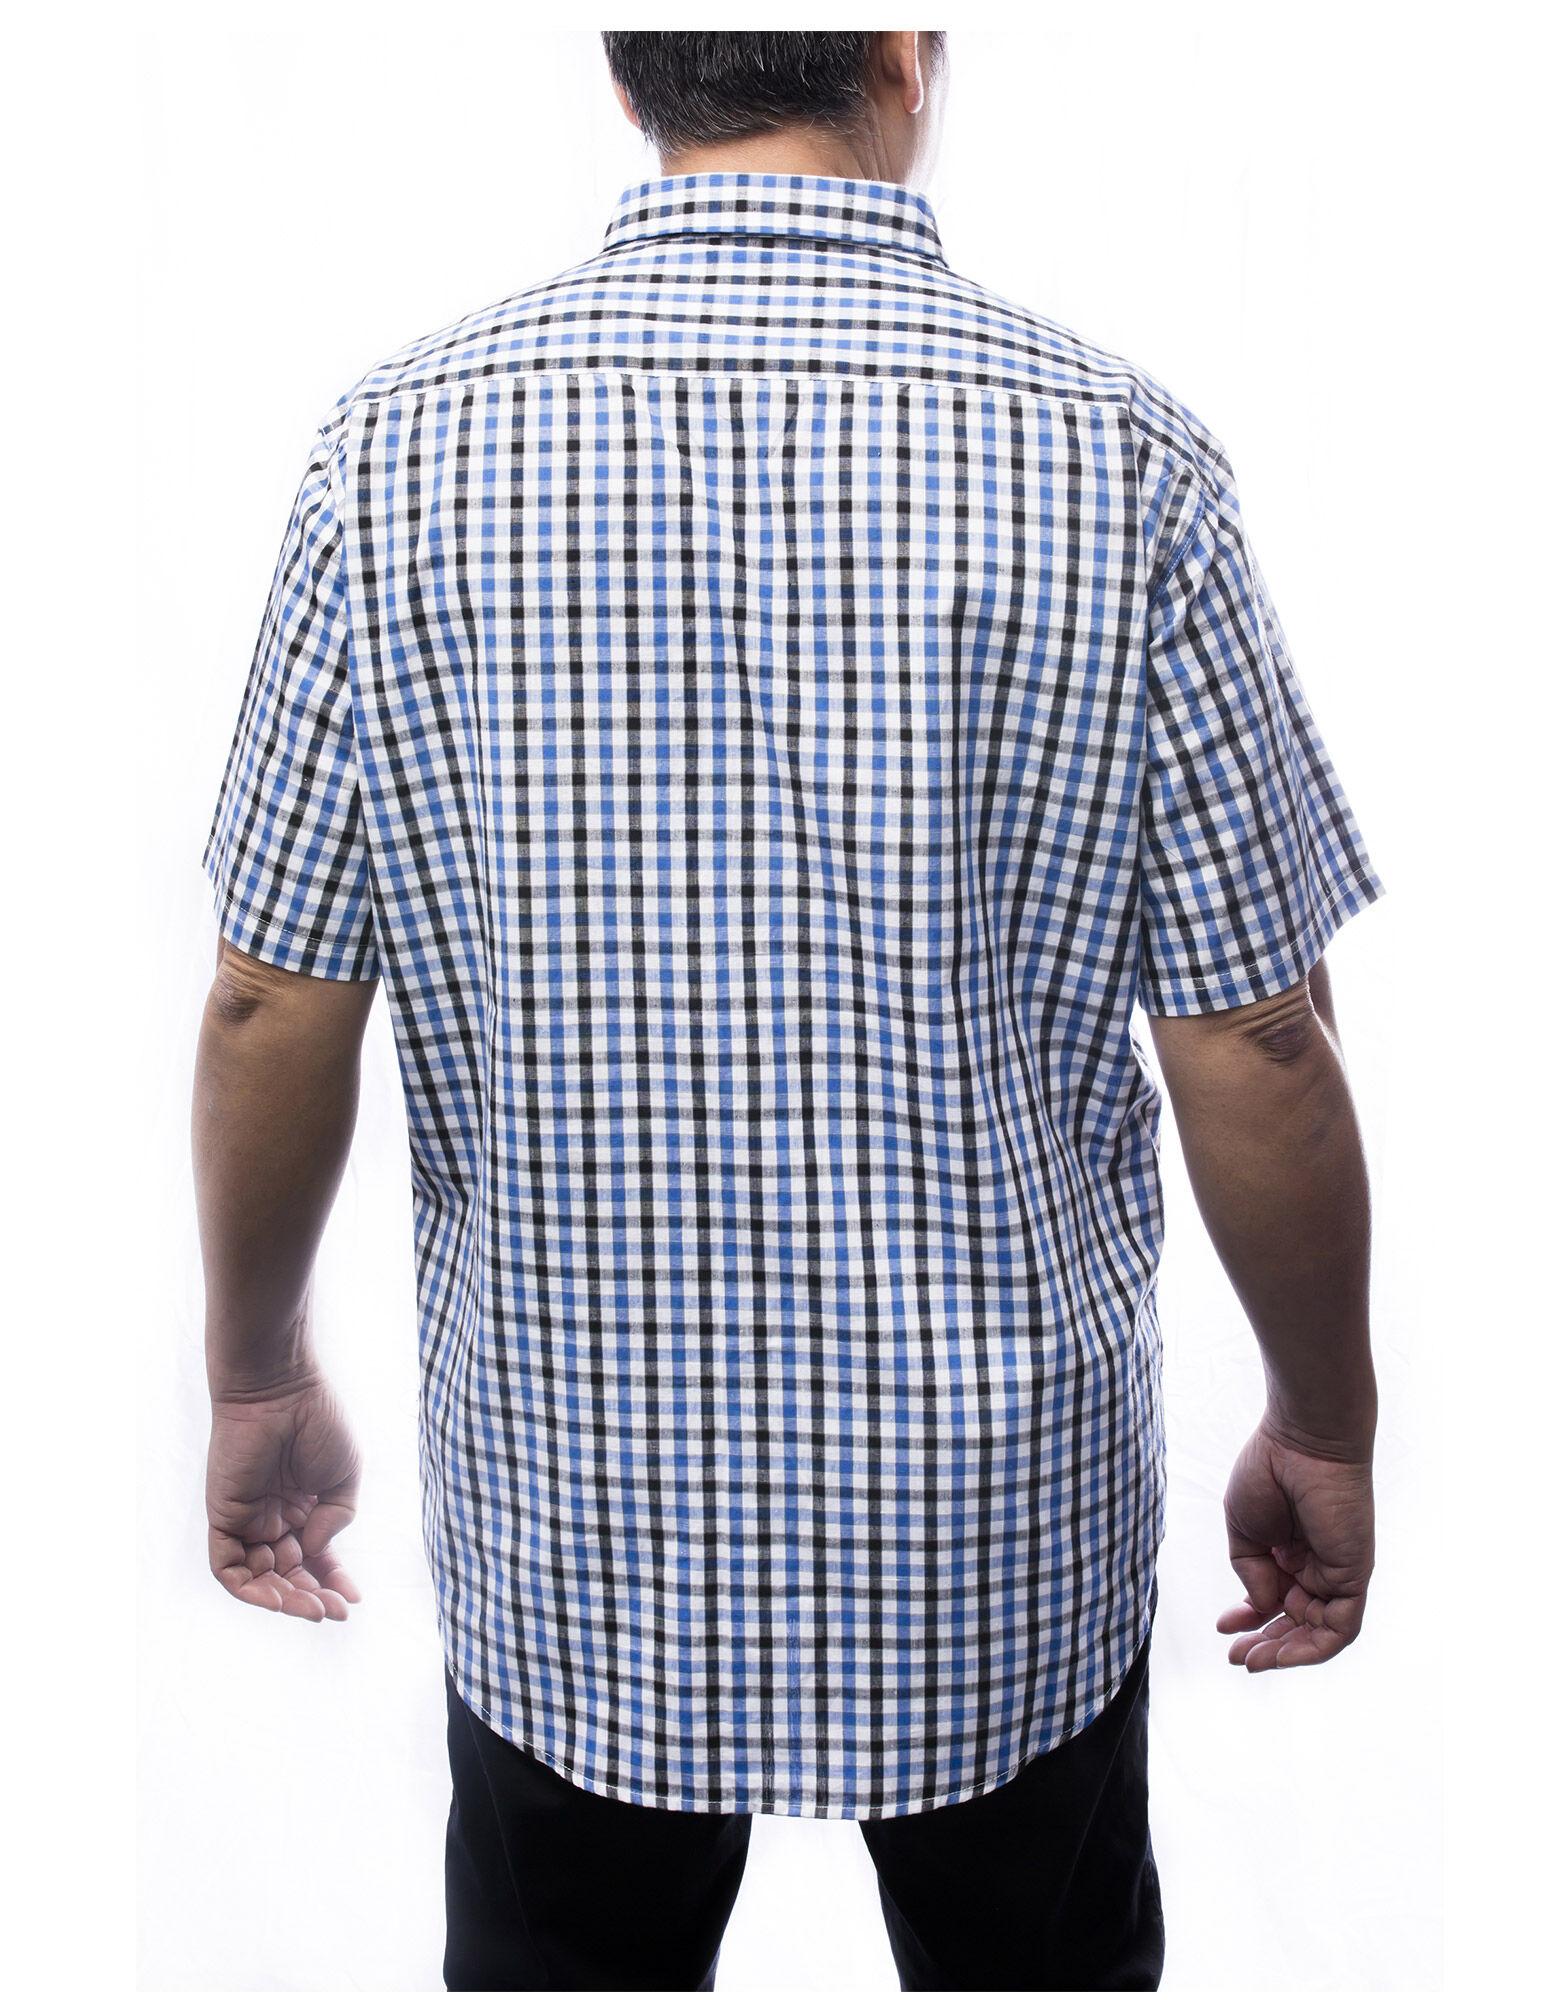 Everyday men 39 s short sleeve plaid shirt dickies canada for Dickies short sleeve plaid shirt